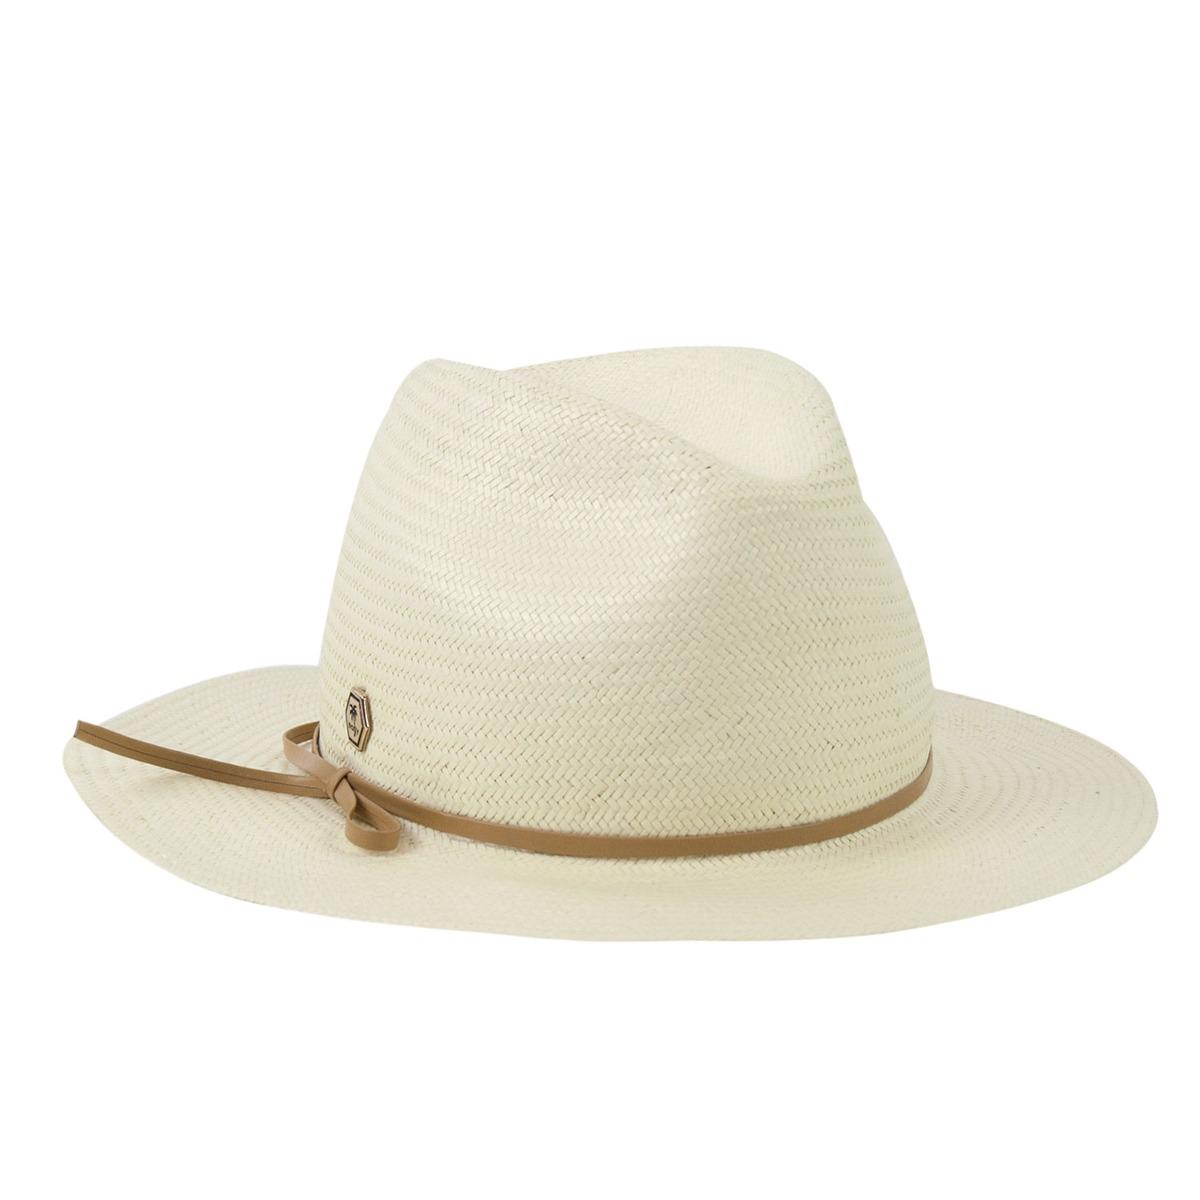 chapéu floppy feminino moda panamá. Carregando zoom. 68e3c2c63ea